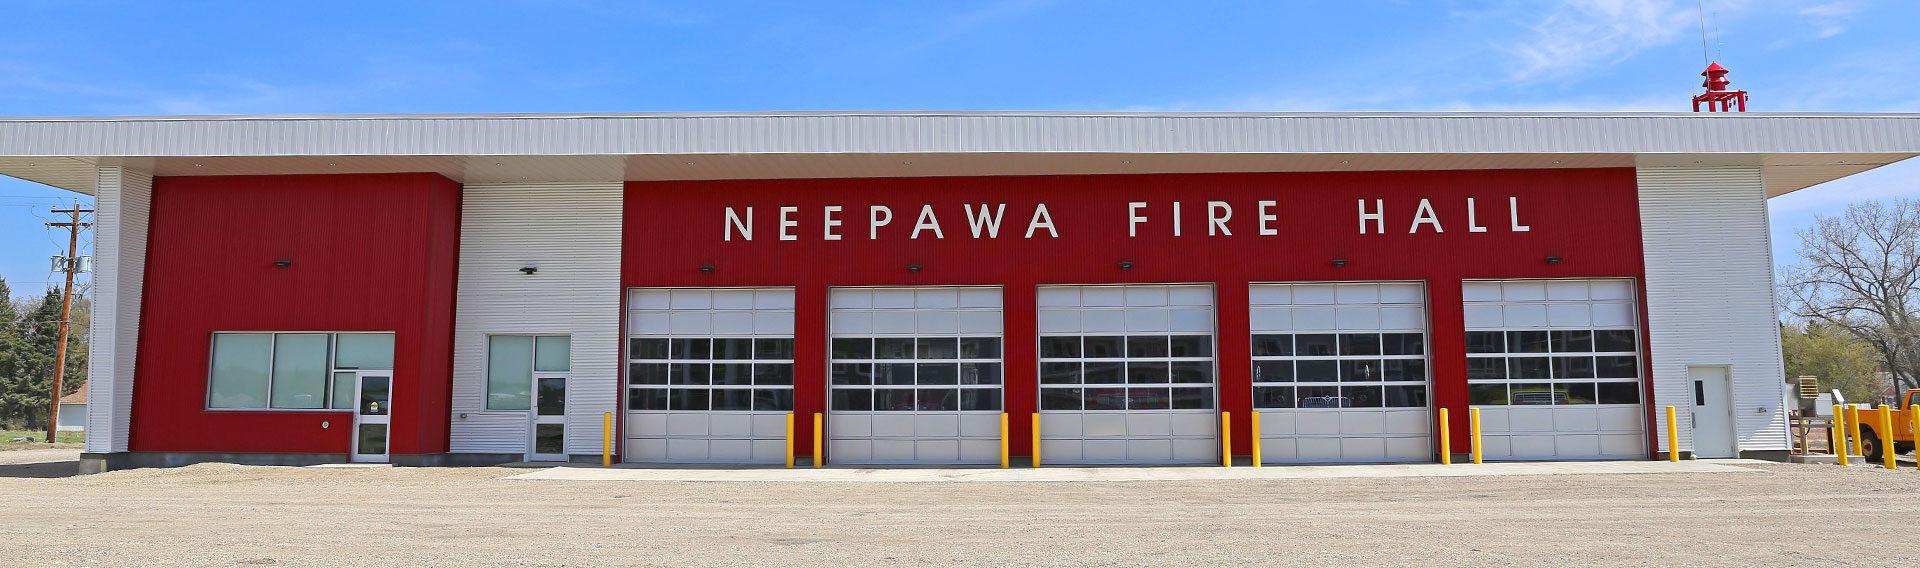 Neepawa Fire Hall